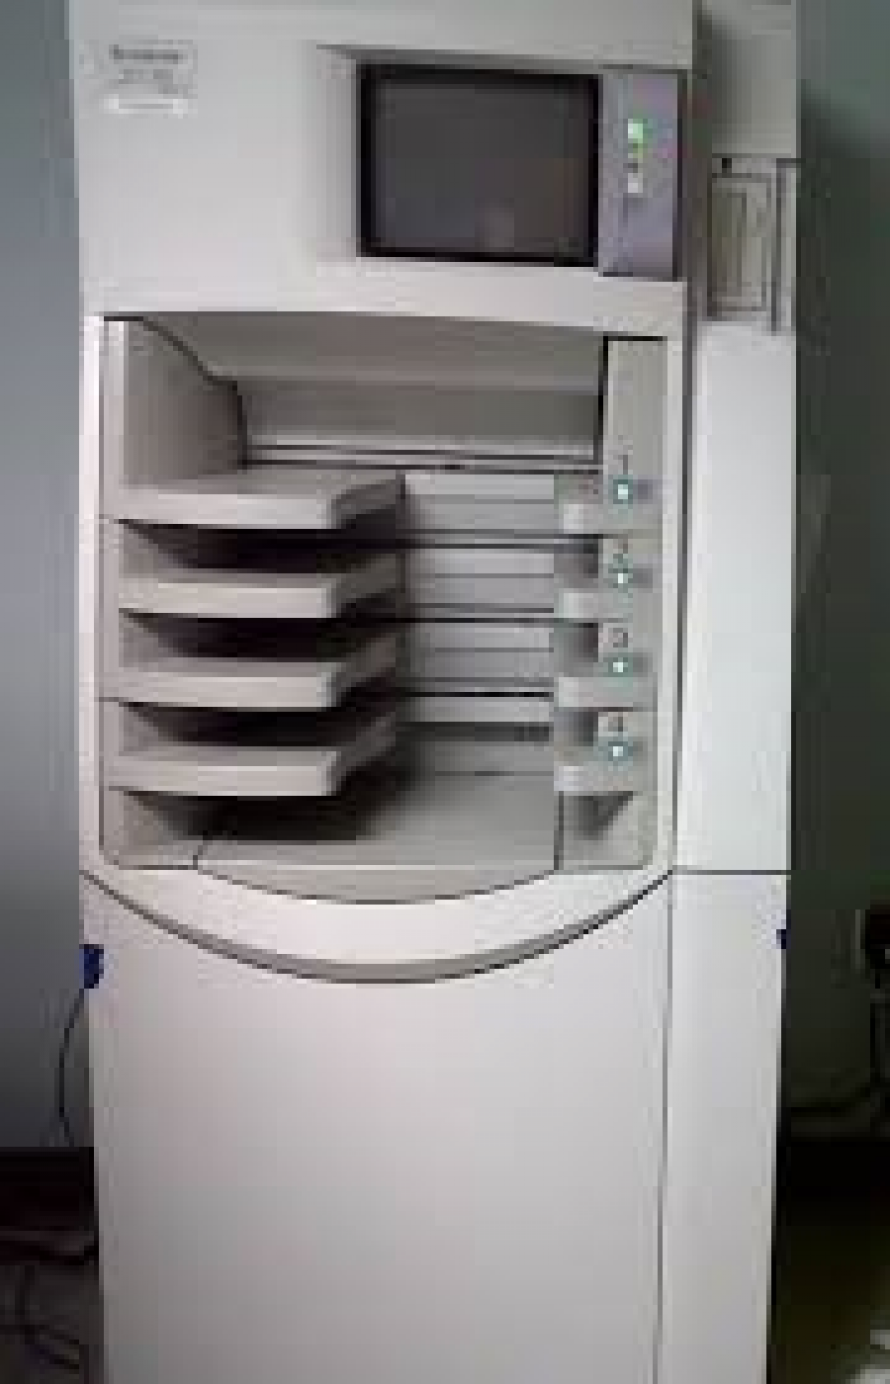 Fuji FCR 5000